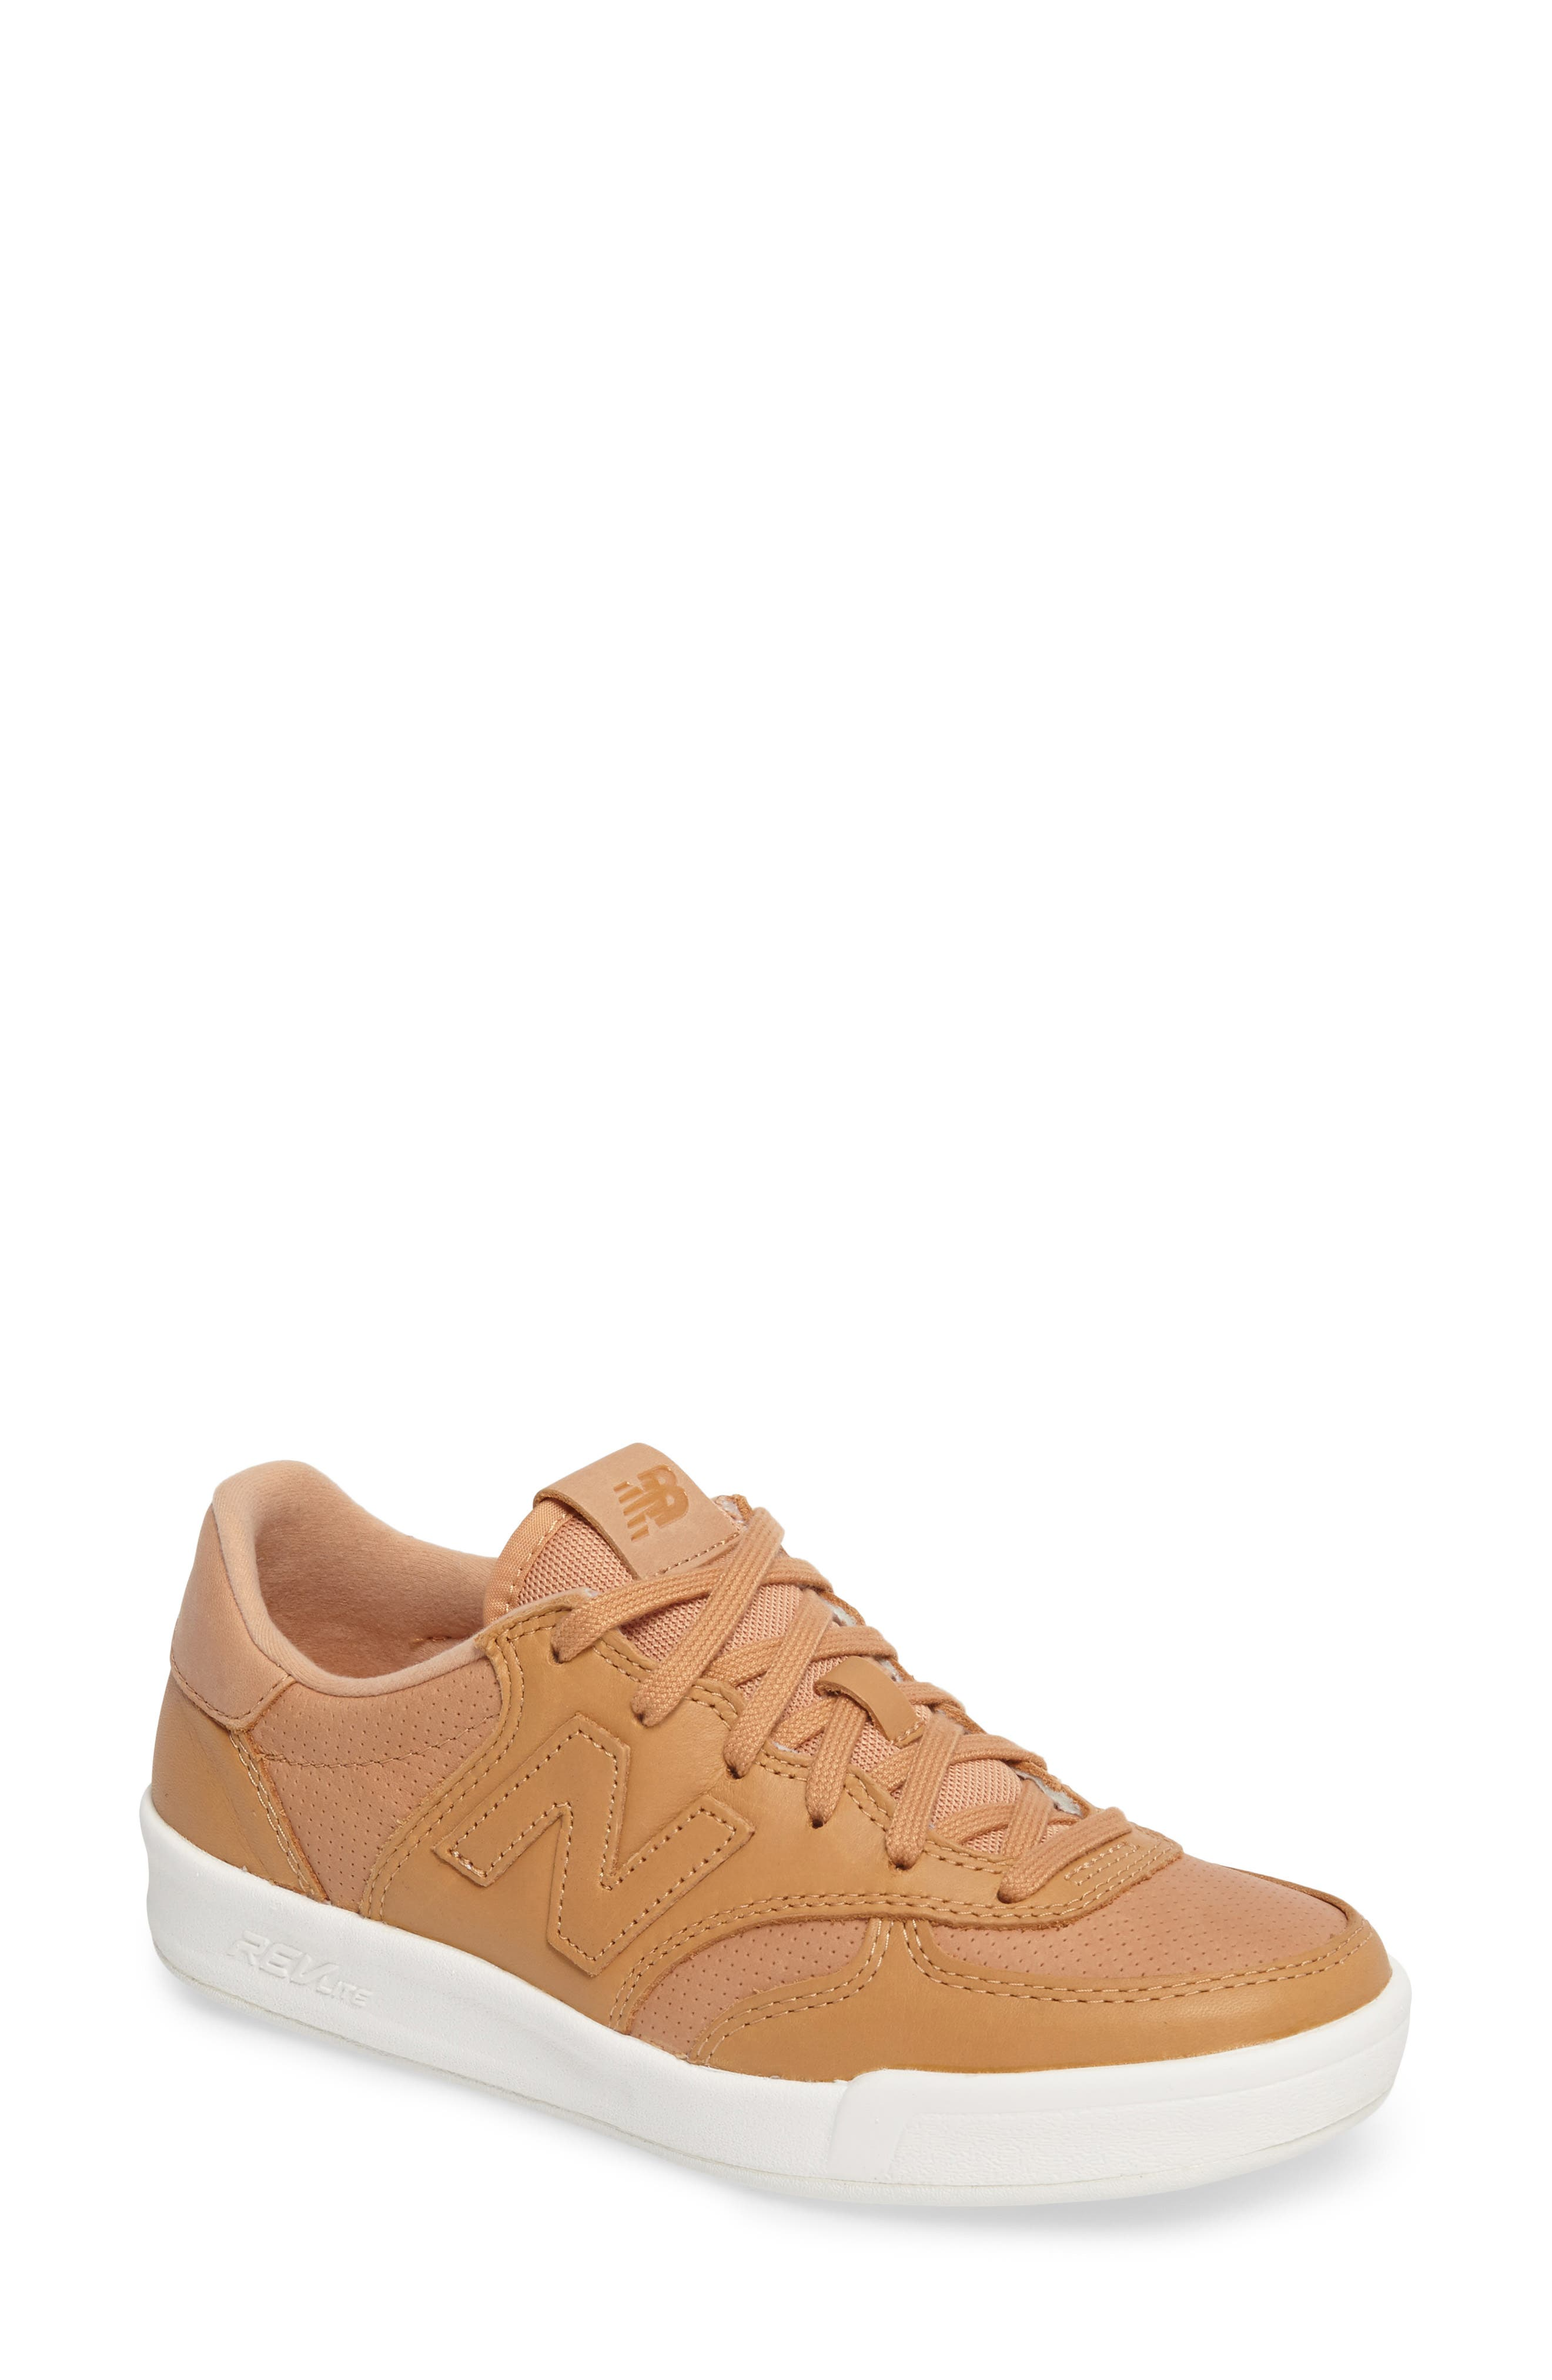 NEW BALANCE 300 Sneaker